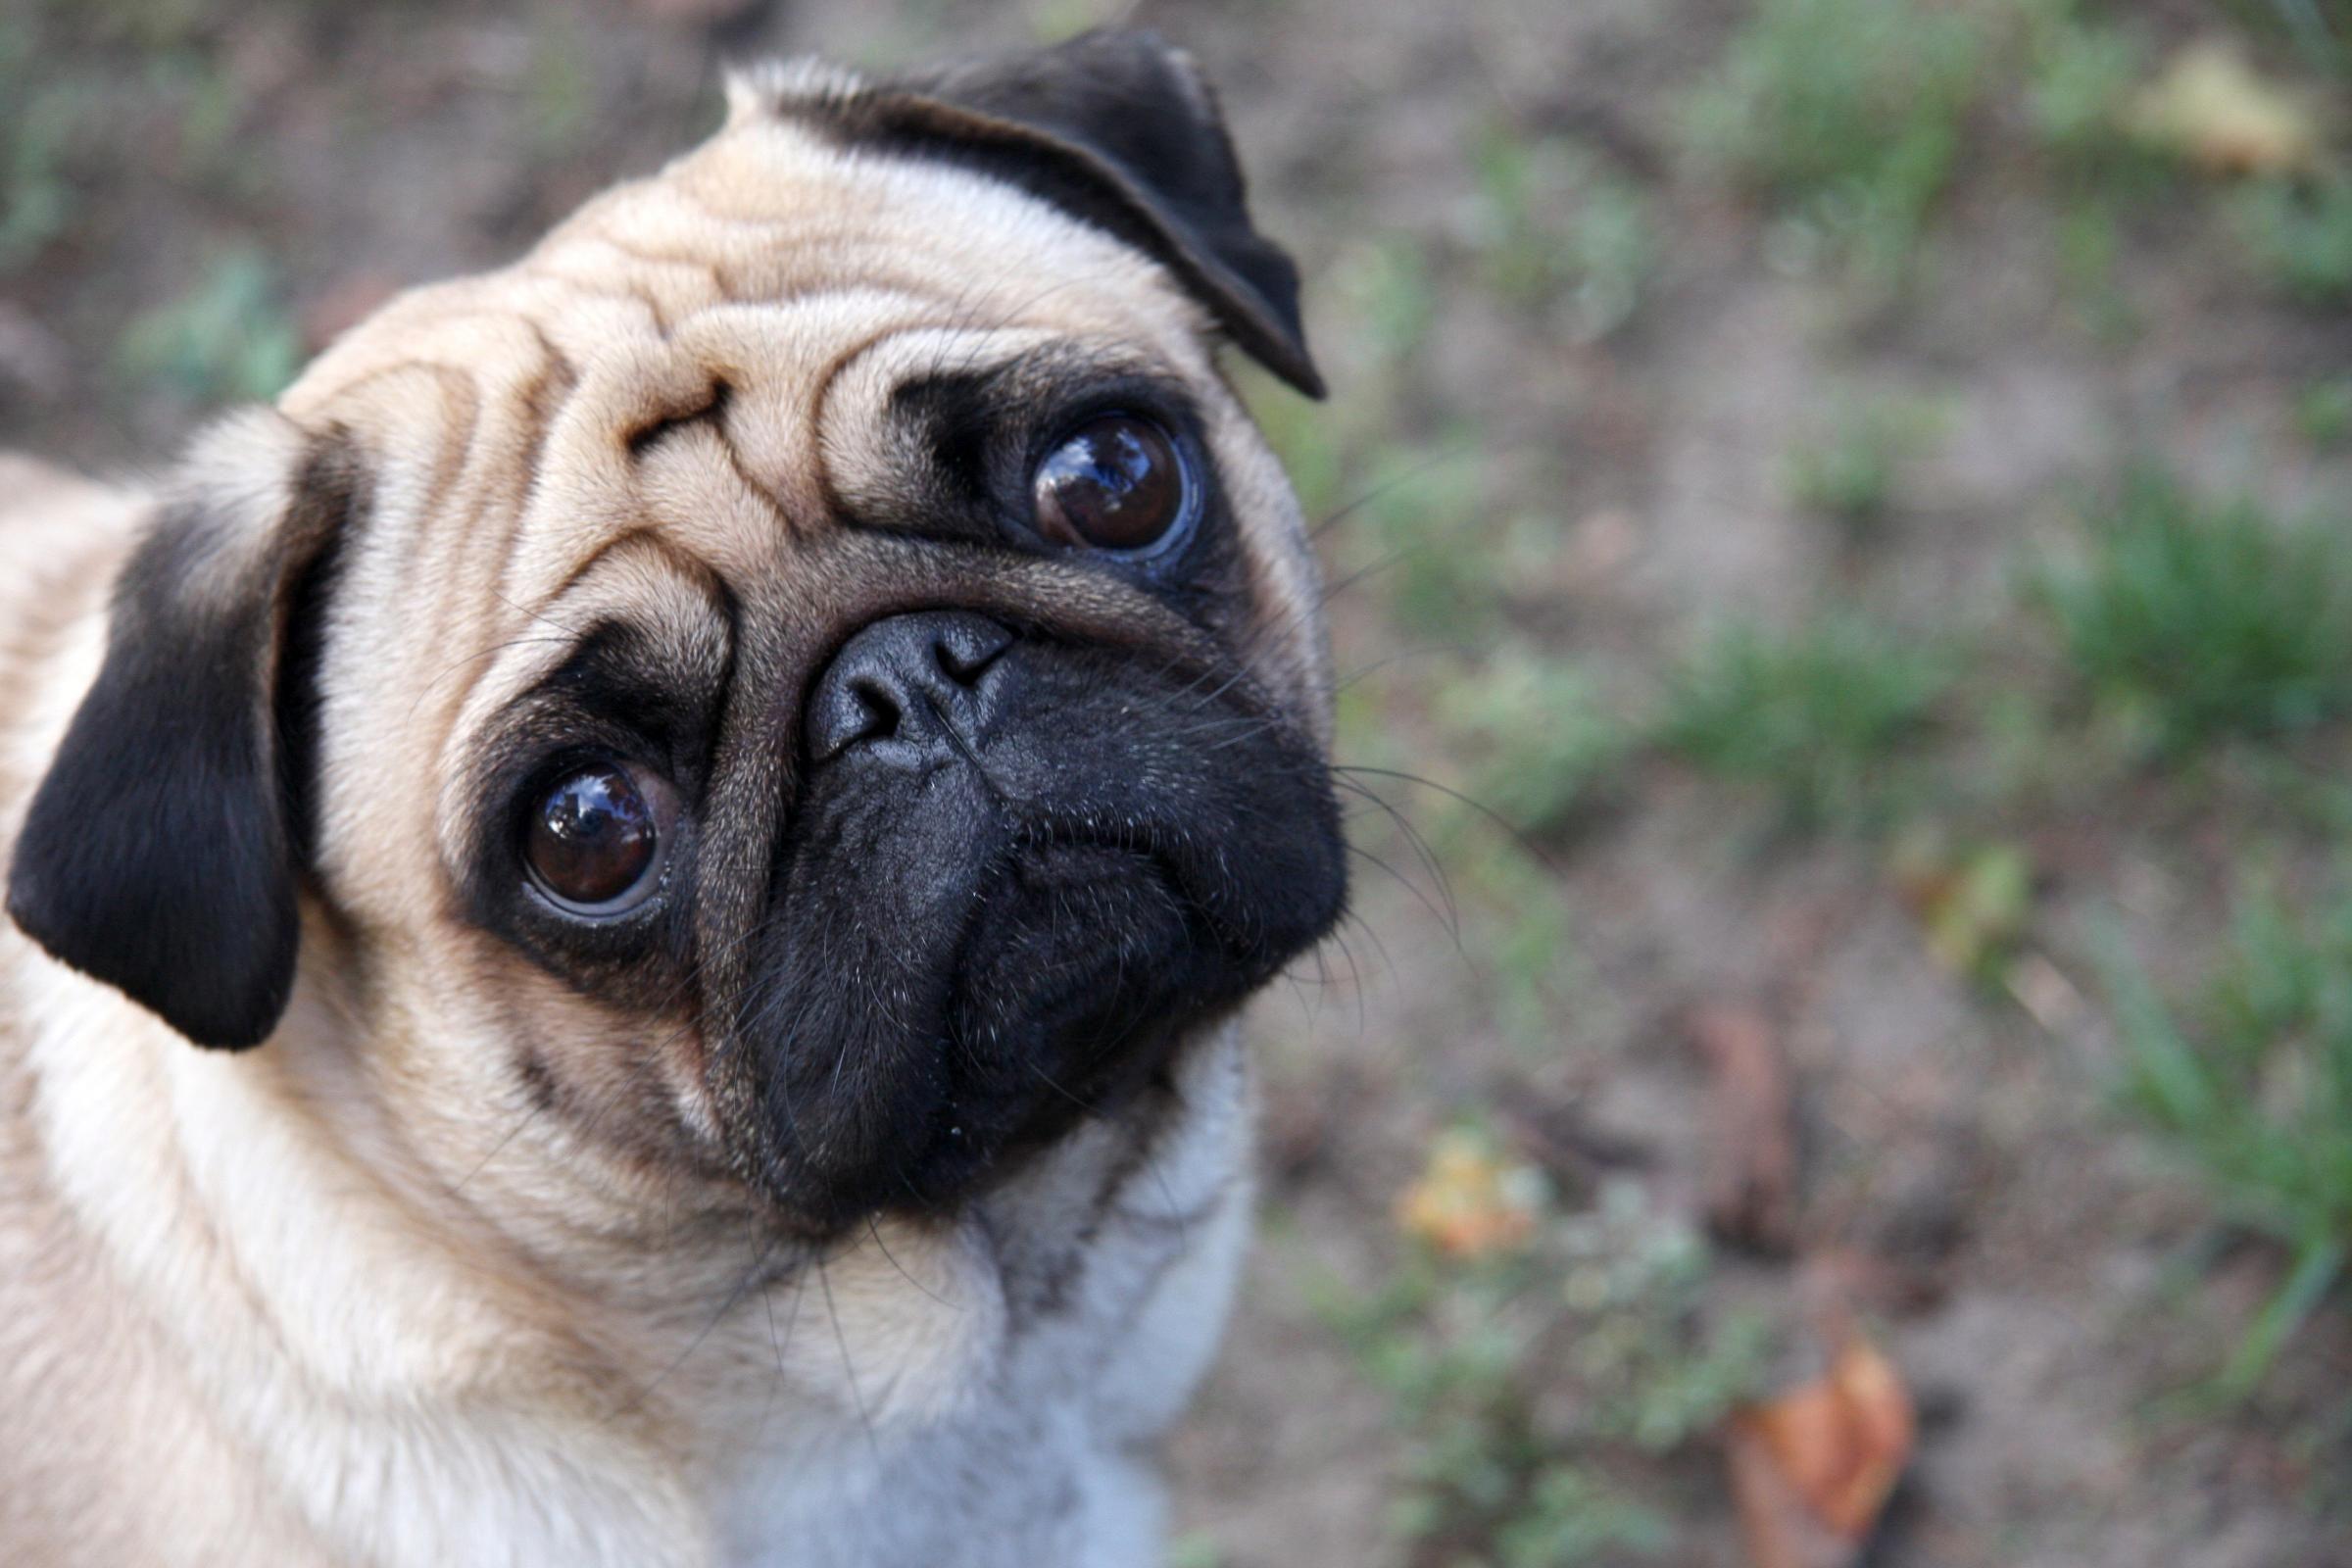 Image Result For Pug Eye Close Up Pugs Dog Health Dog Care